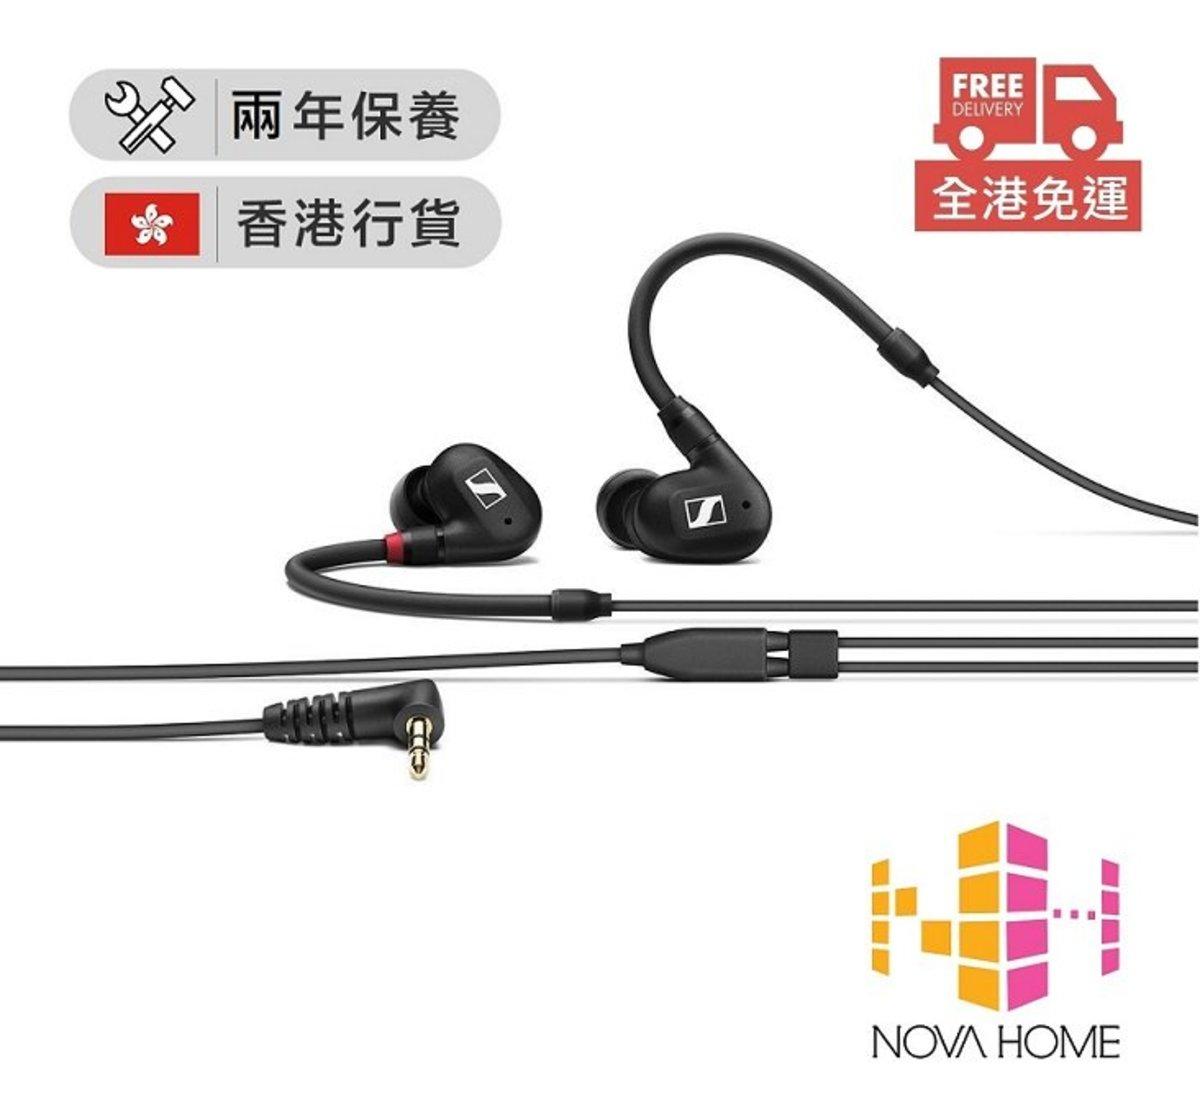 IE 40 Pro Clear 黑色 動圈式 入耳監聽耳機 Handfree Earphone Earbuds